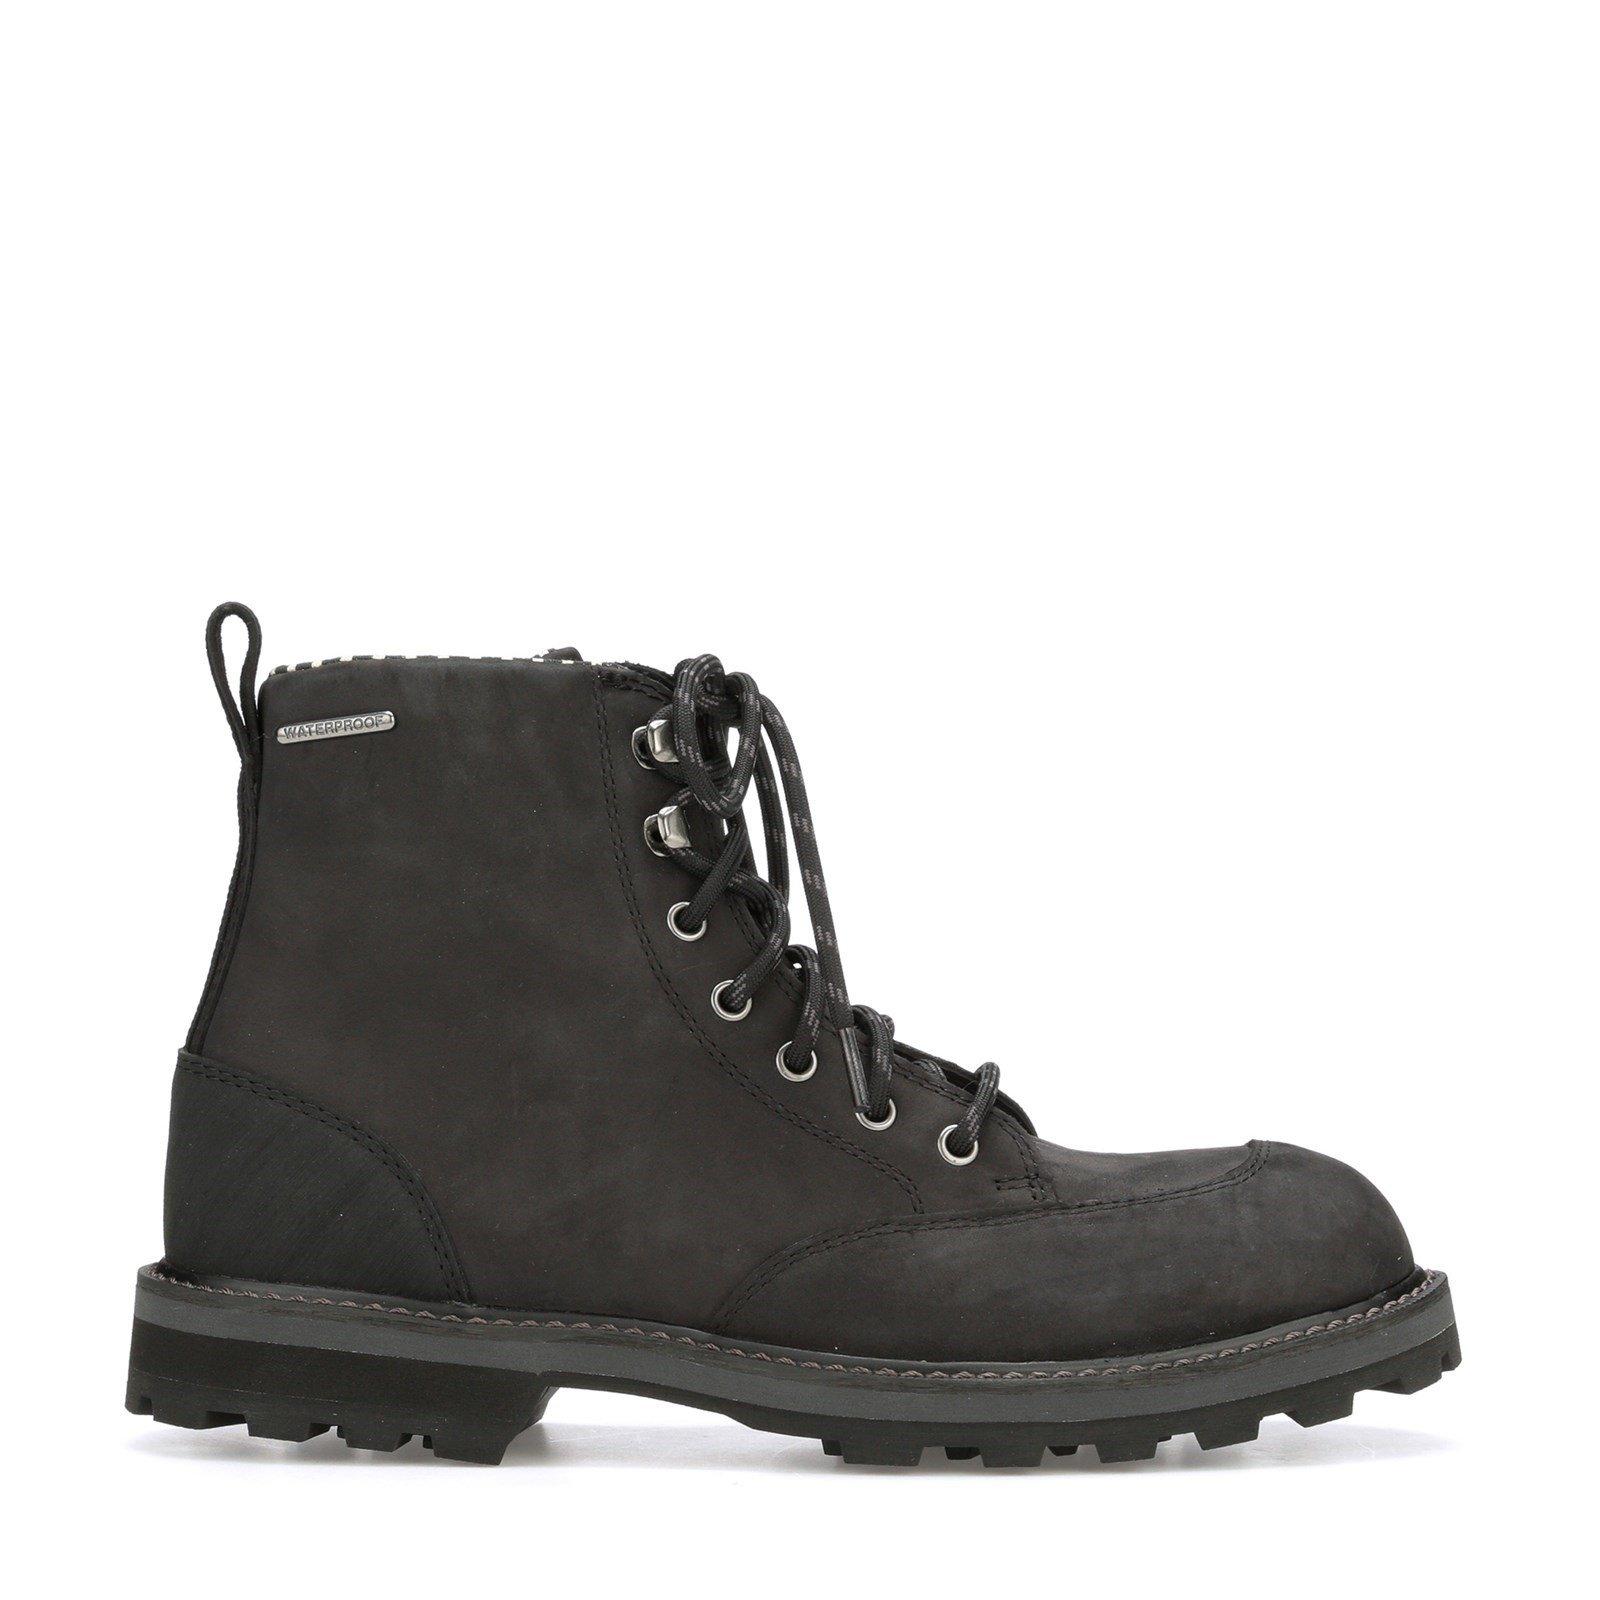 Muck Boots Men's Foreman Boot Black 31854 - Black 14